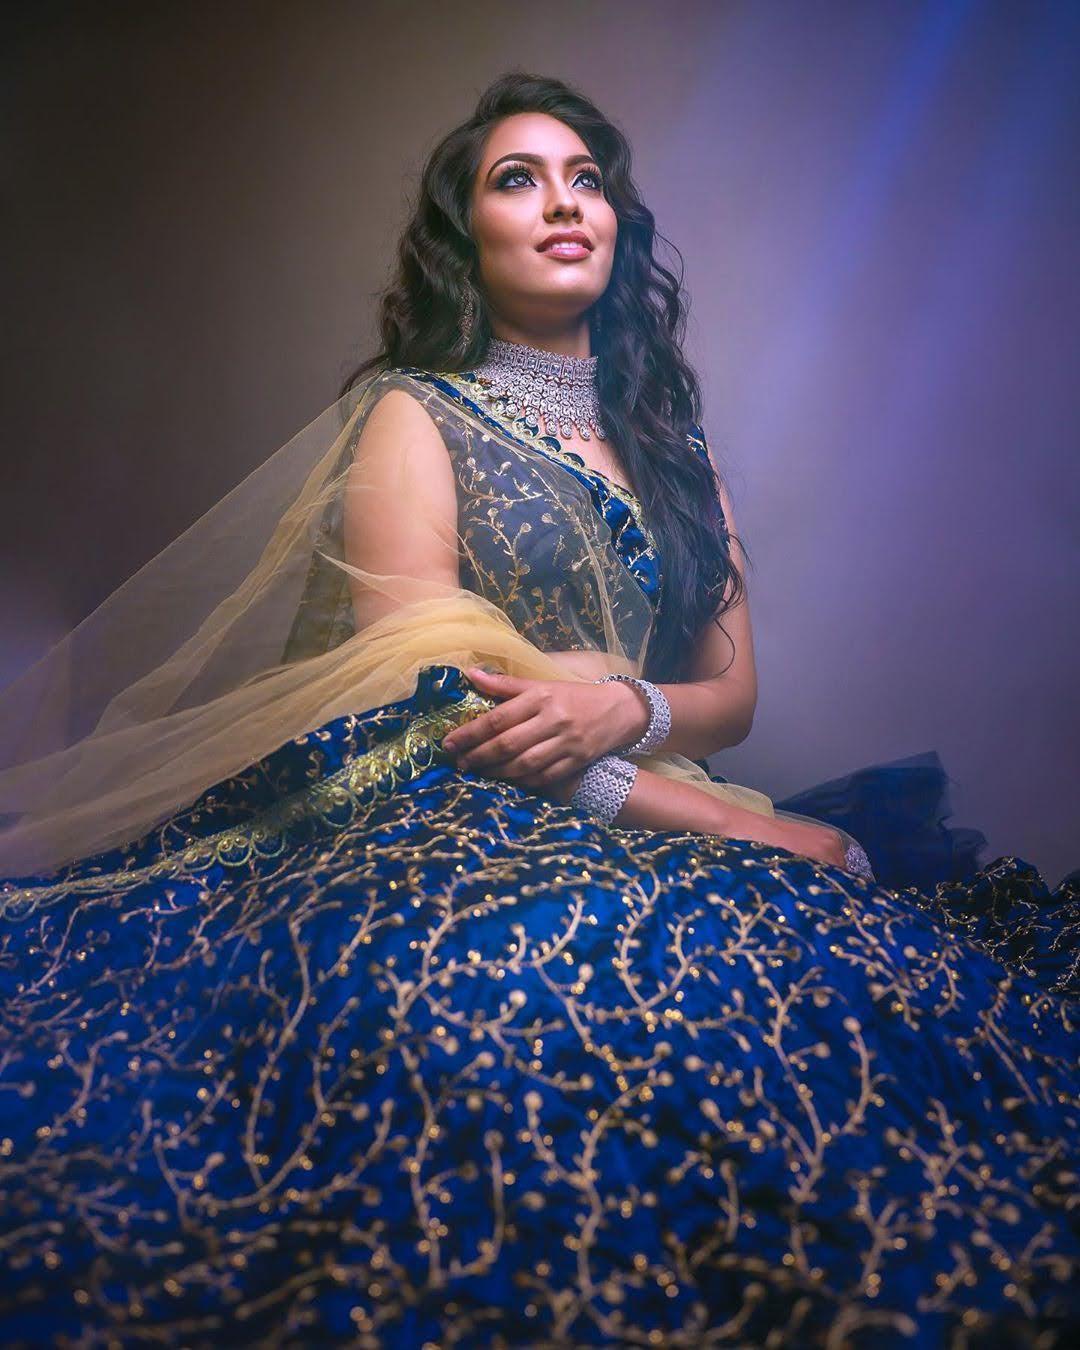 pavithra-janani-64709